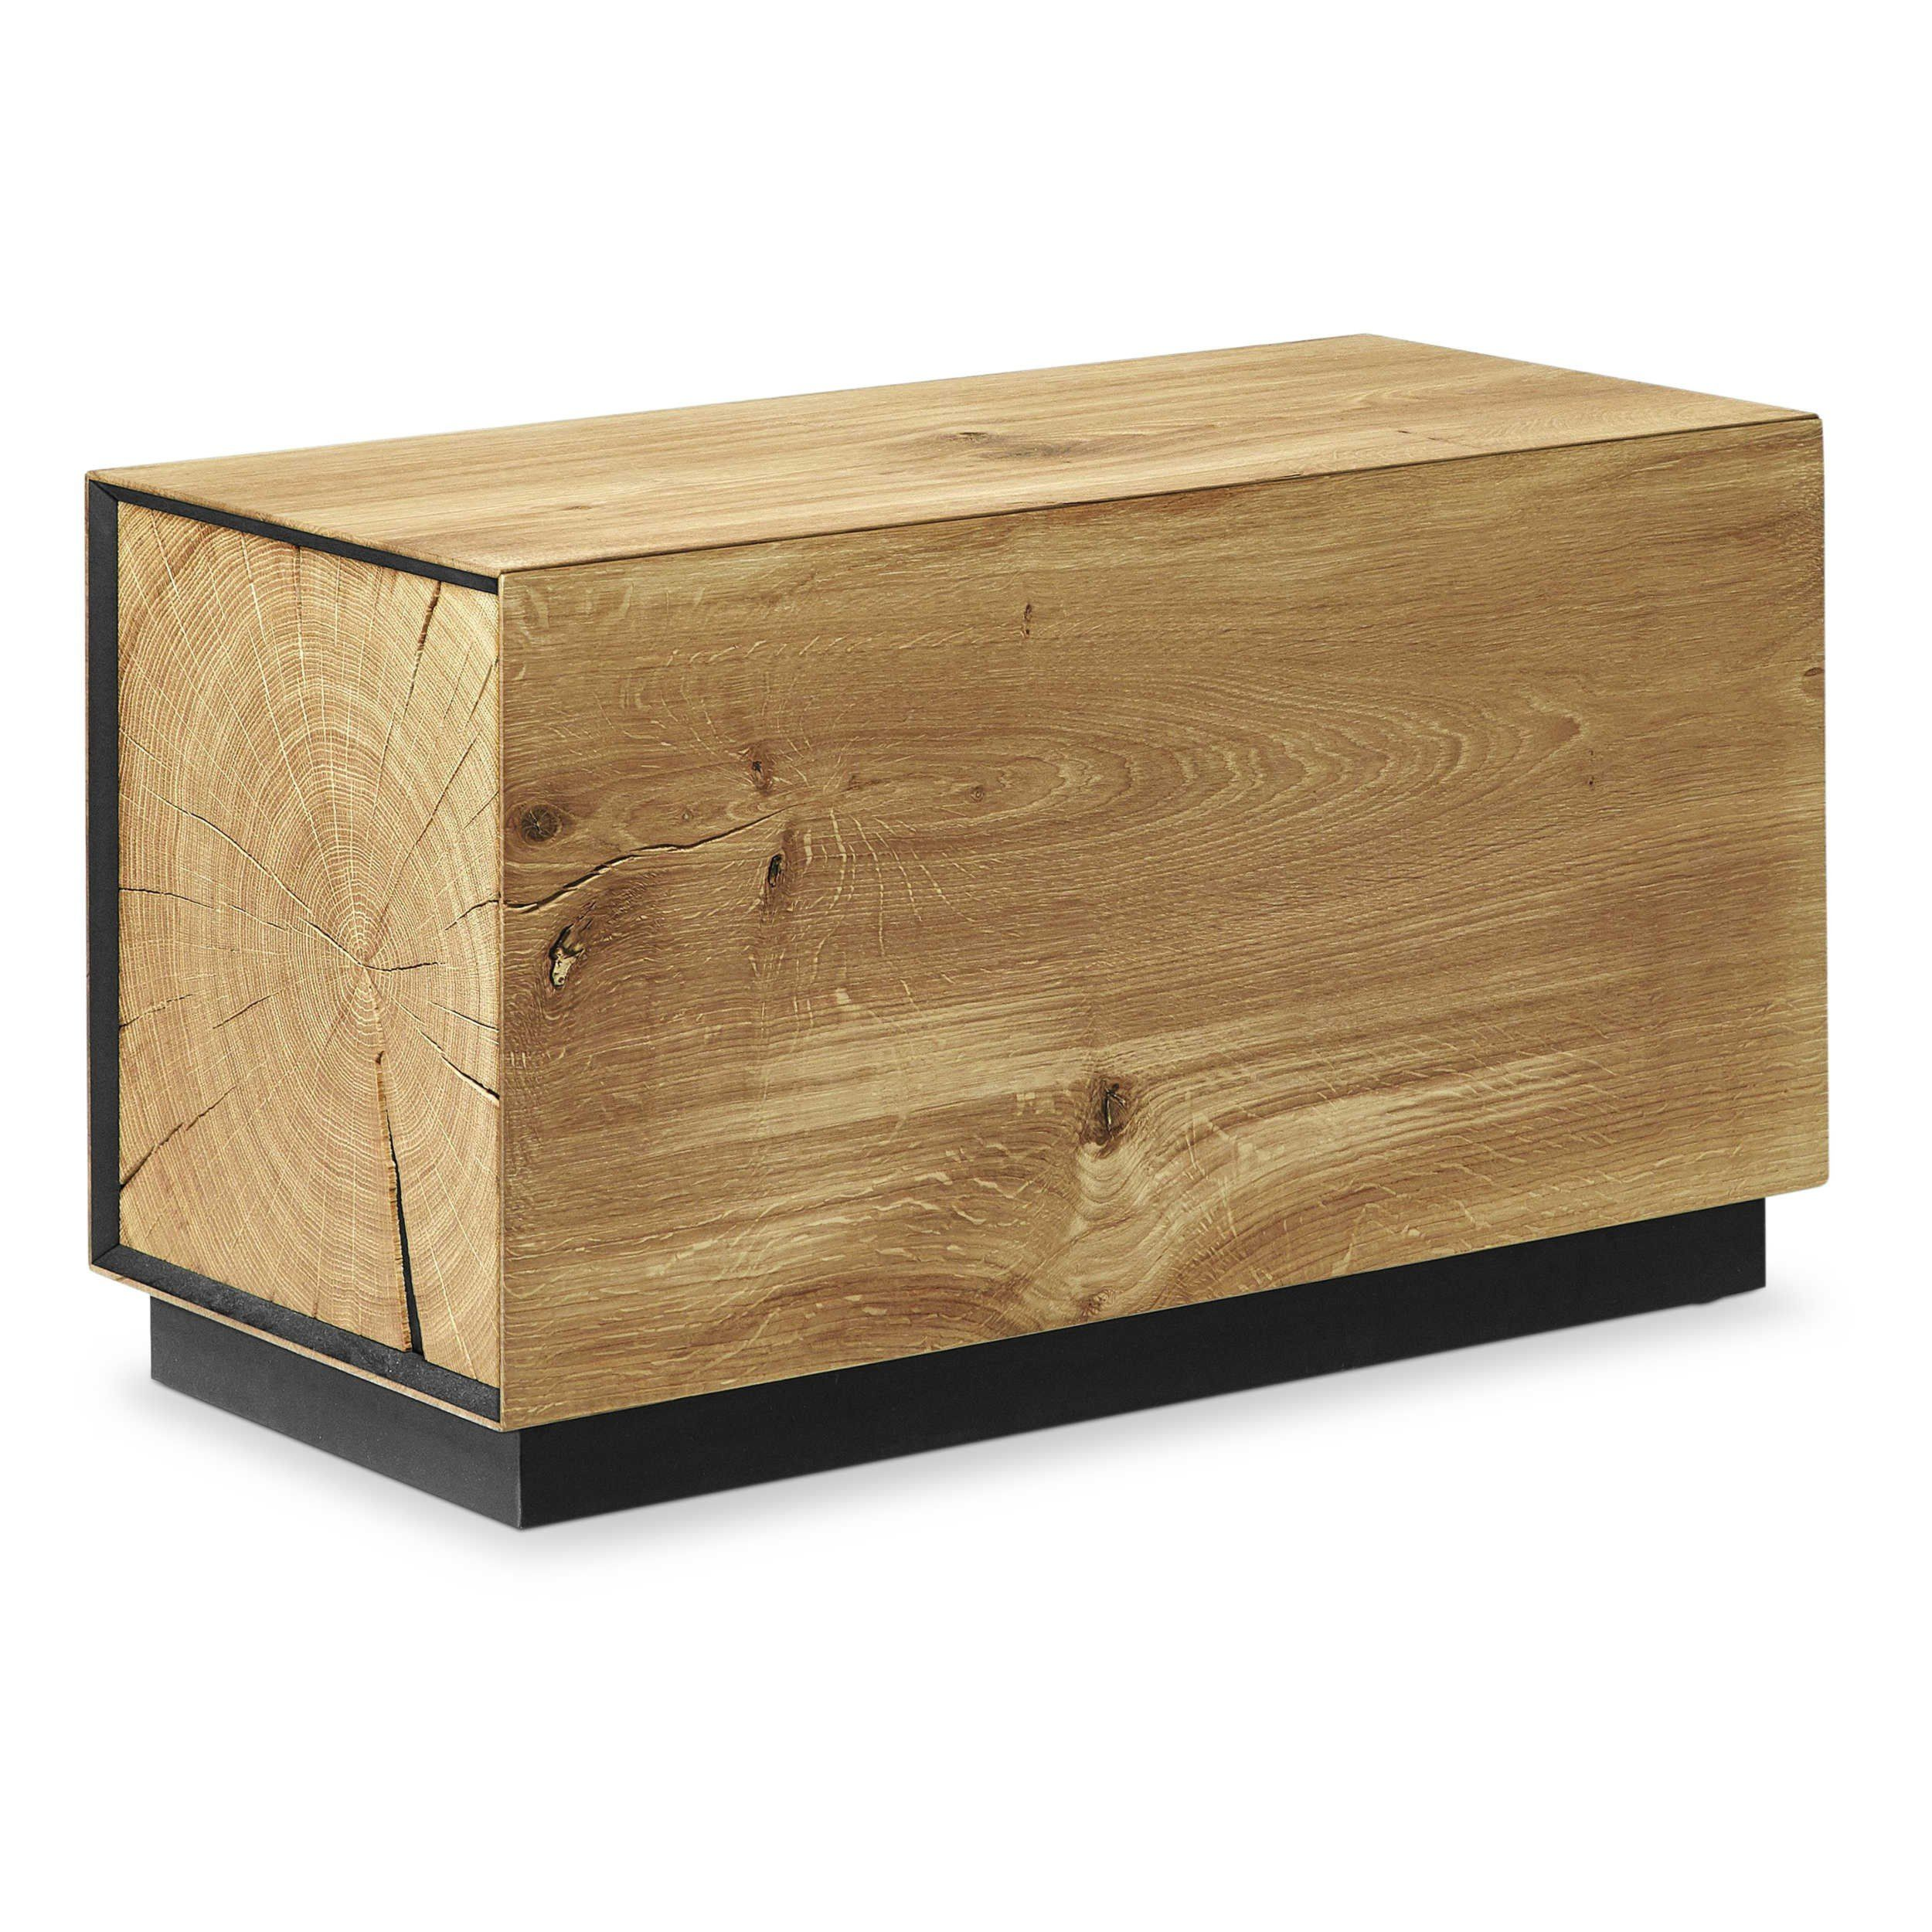 Dryad Garderobenbank Dryad Eiche Holz Gunstig Bei Segmuller